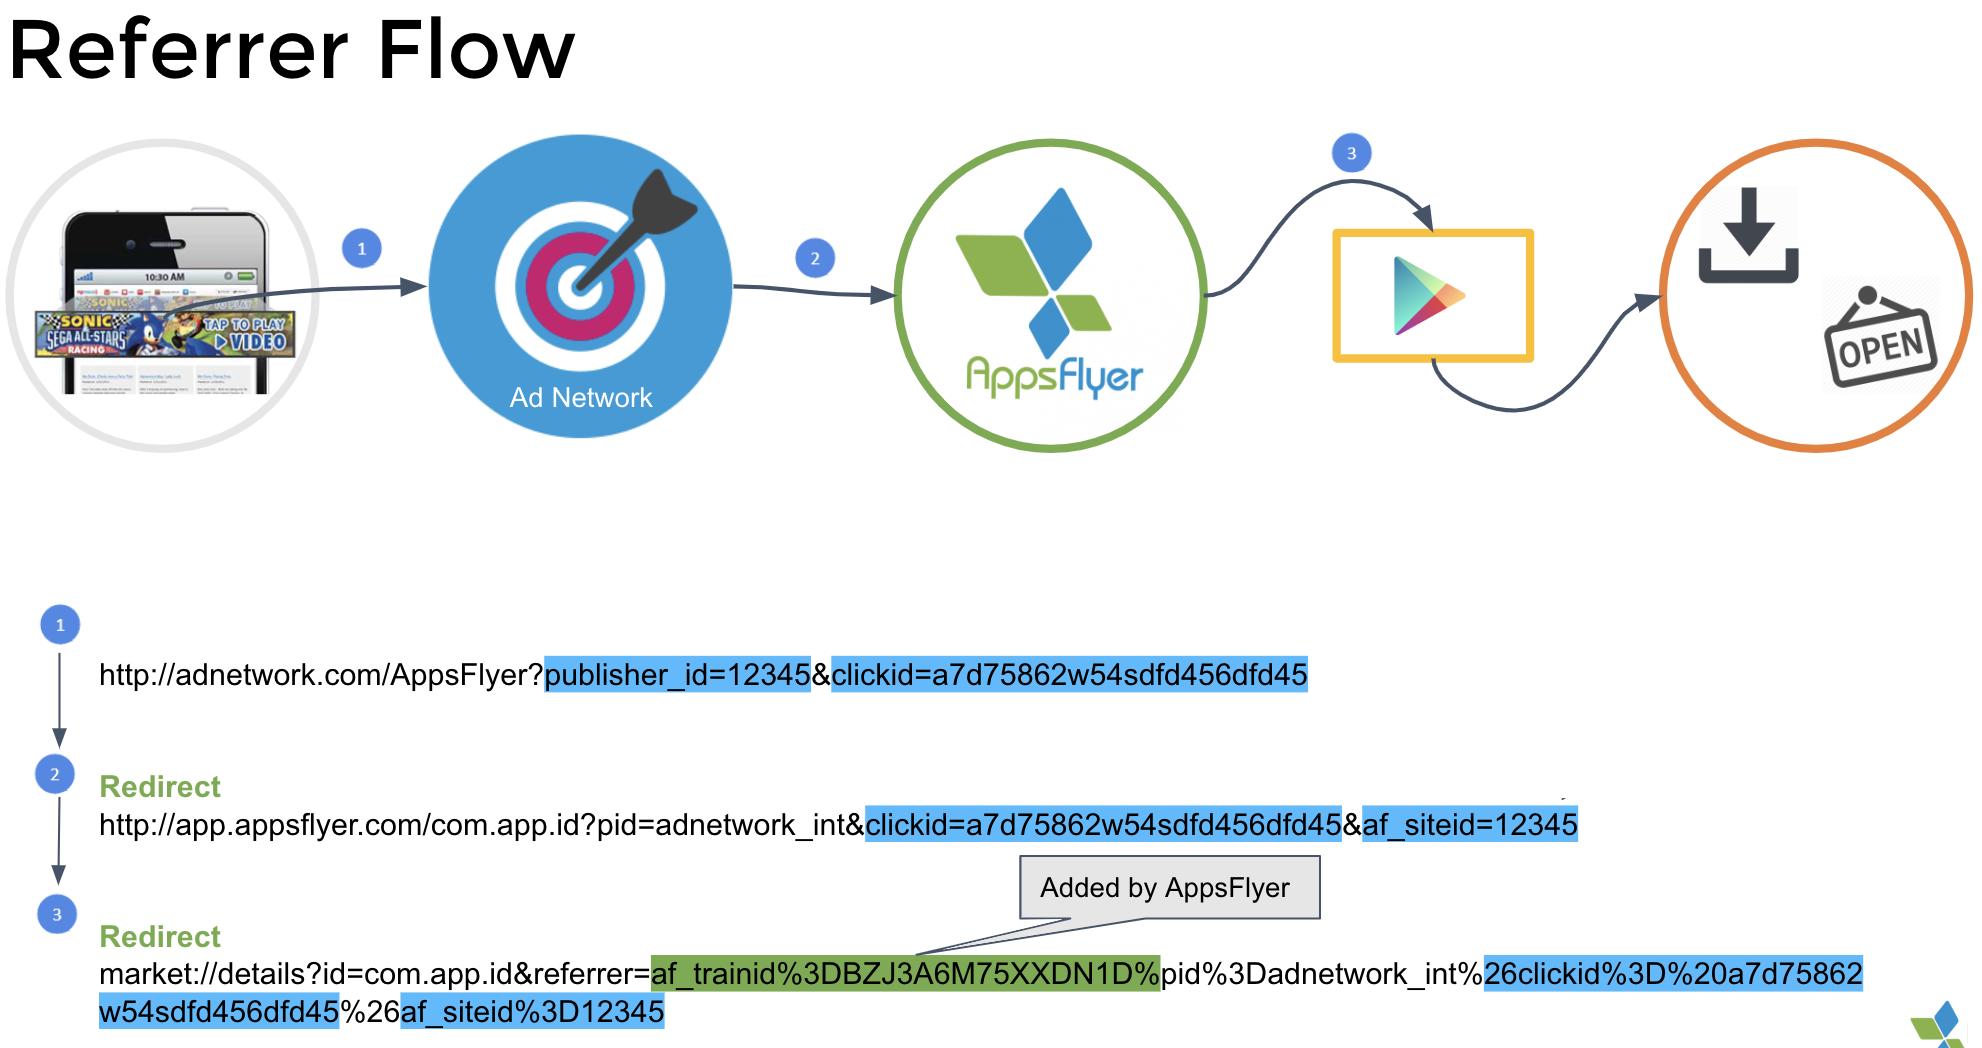 Attribution flow in AppsFlyer: Referrer flow